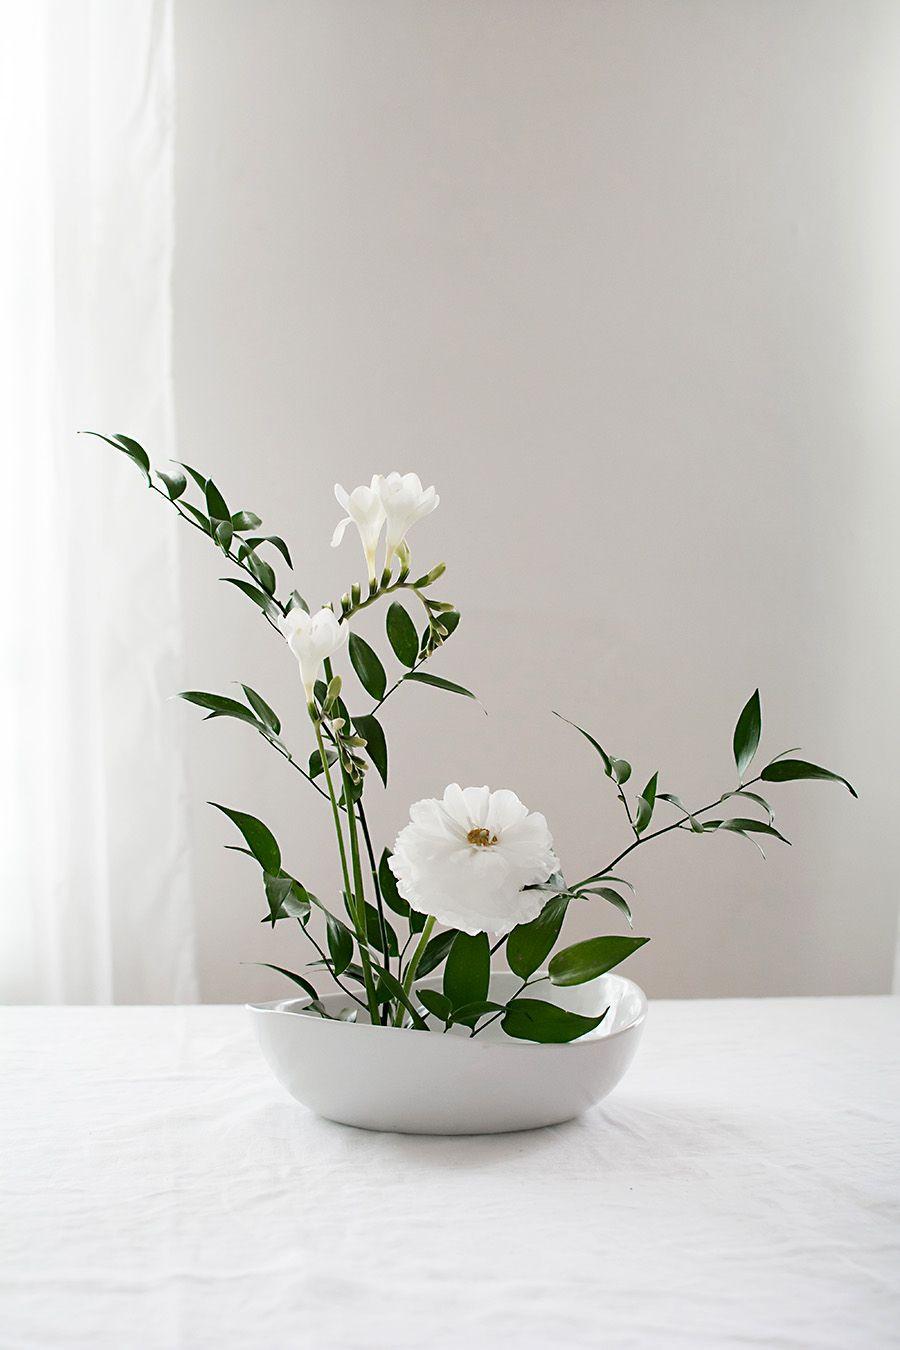 How to Make a Basic Ikebana Floral Arrangement - | Ikebana, Floral ...